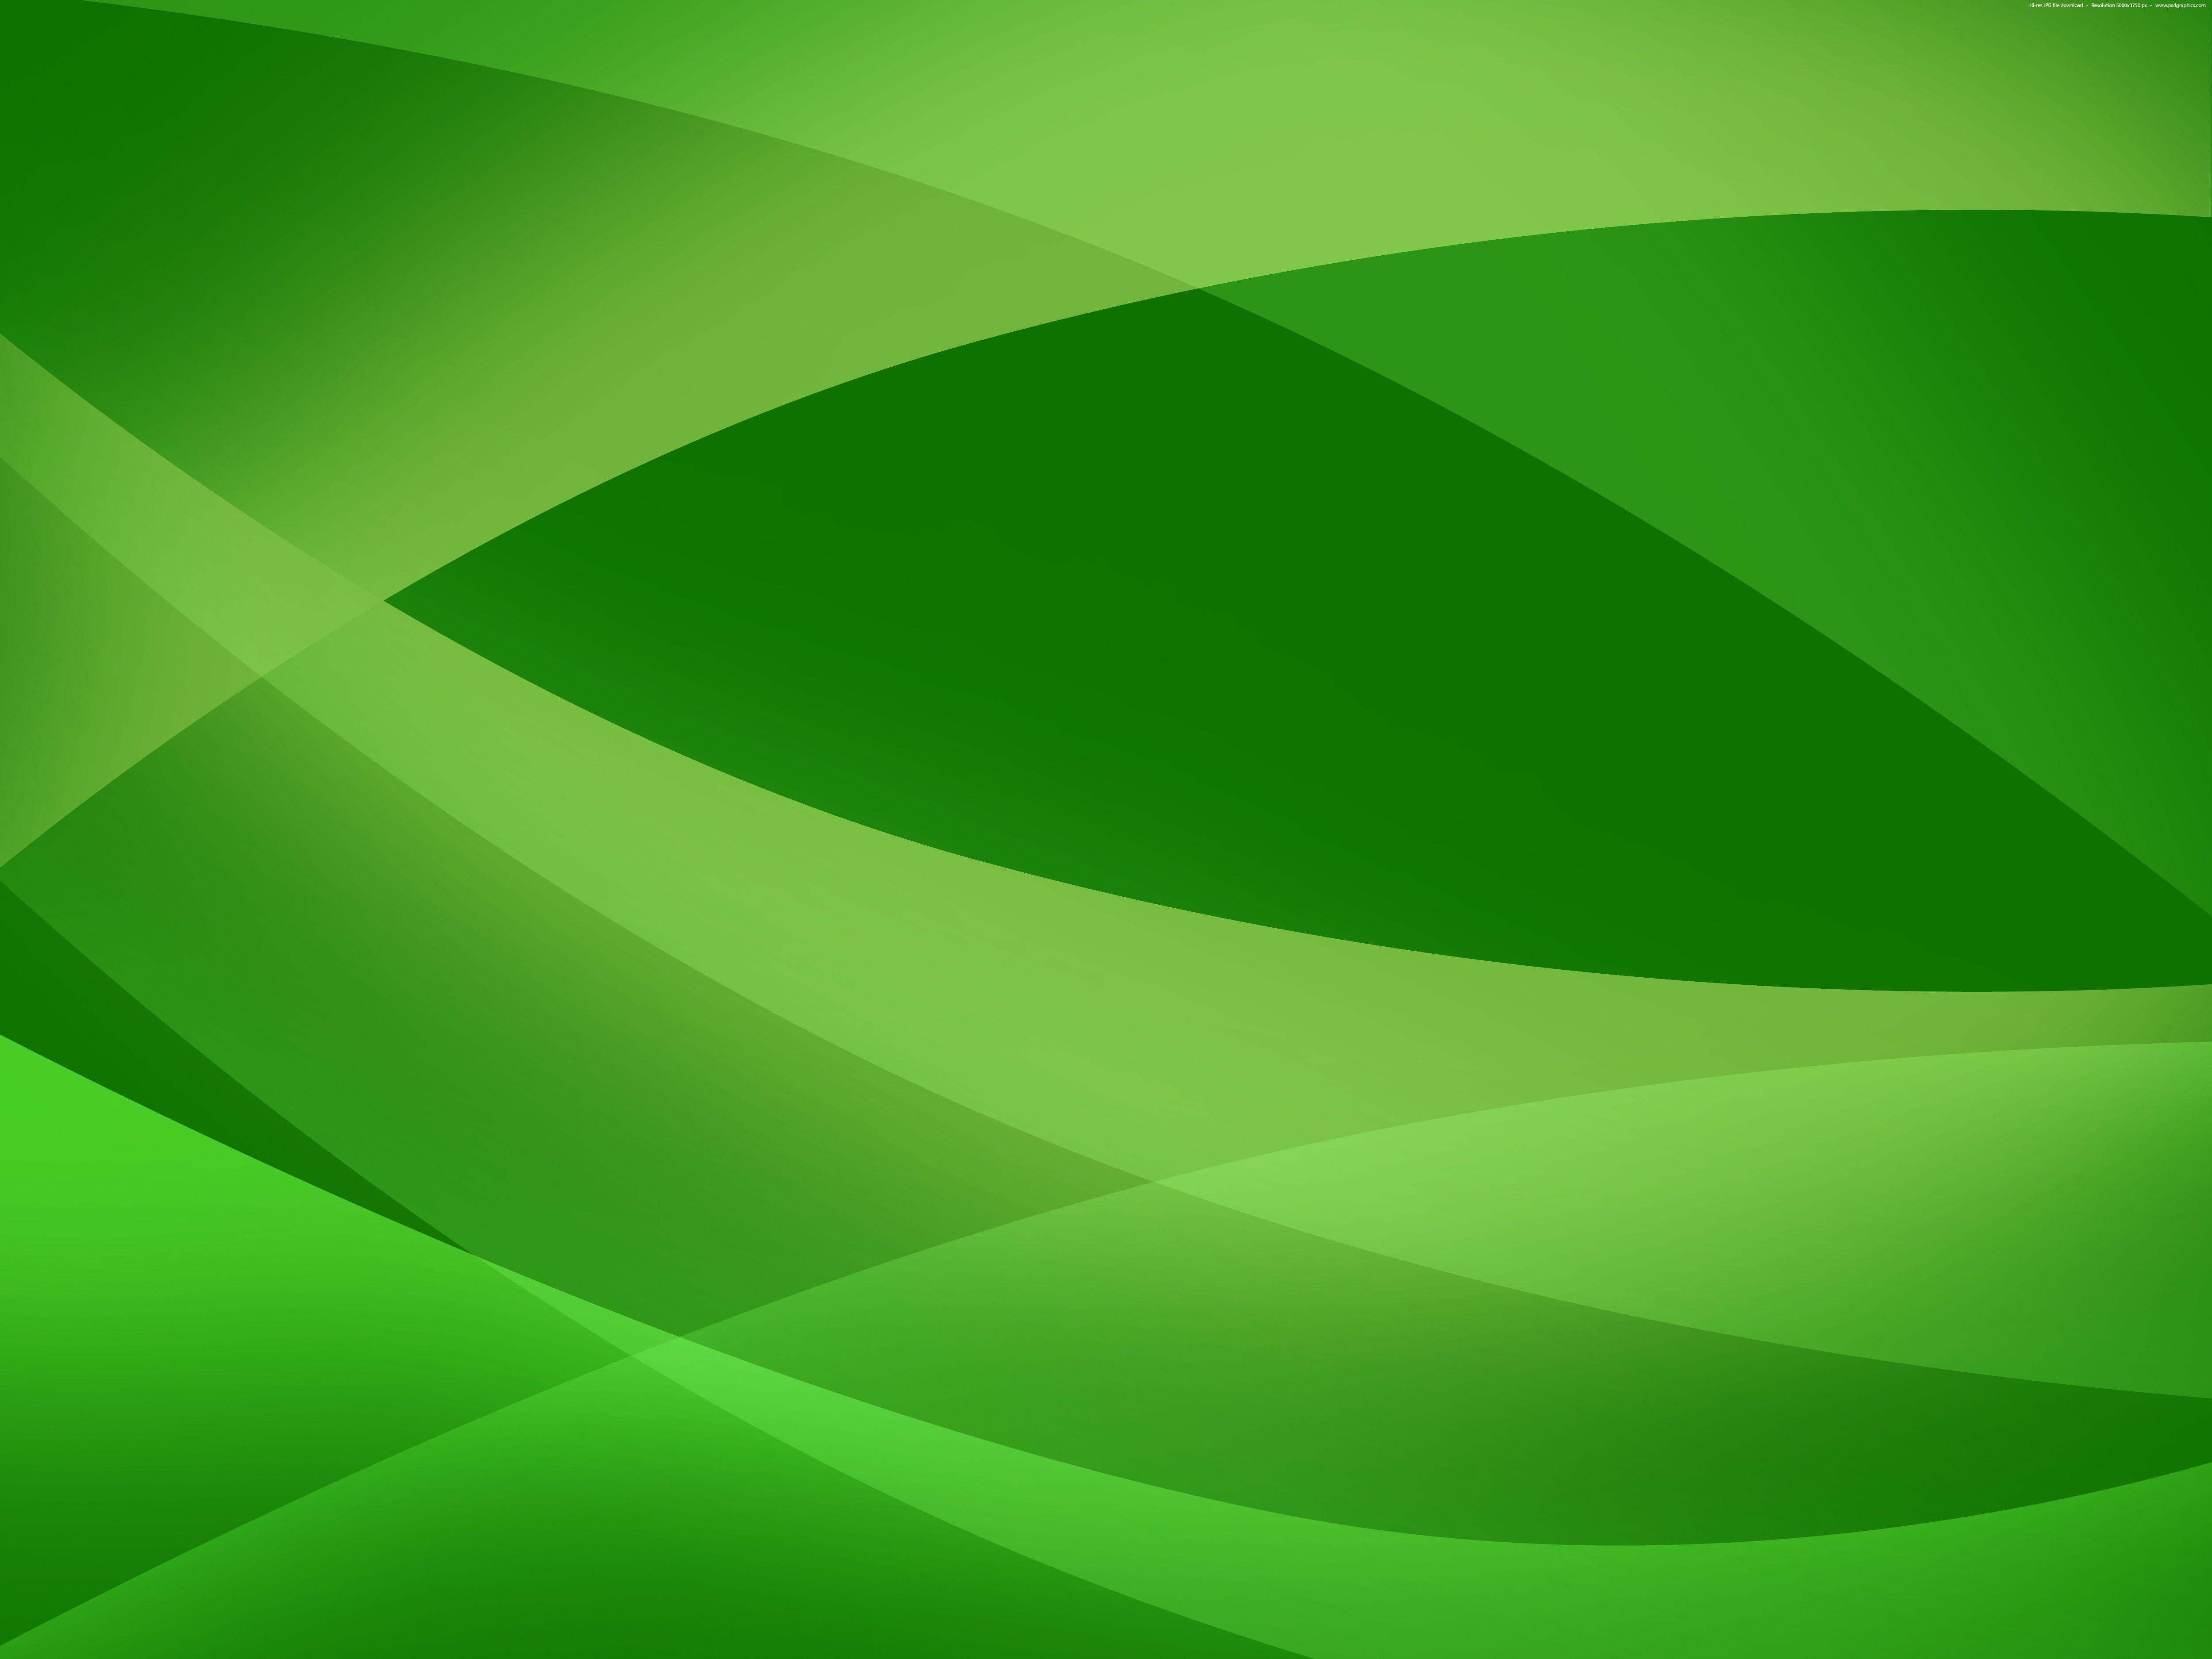 green background 13 5000x3750